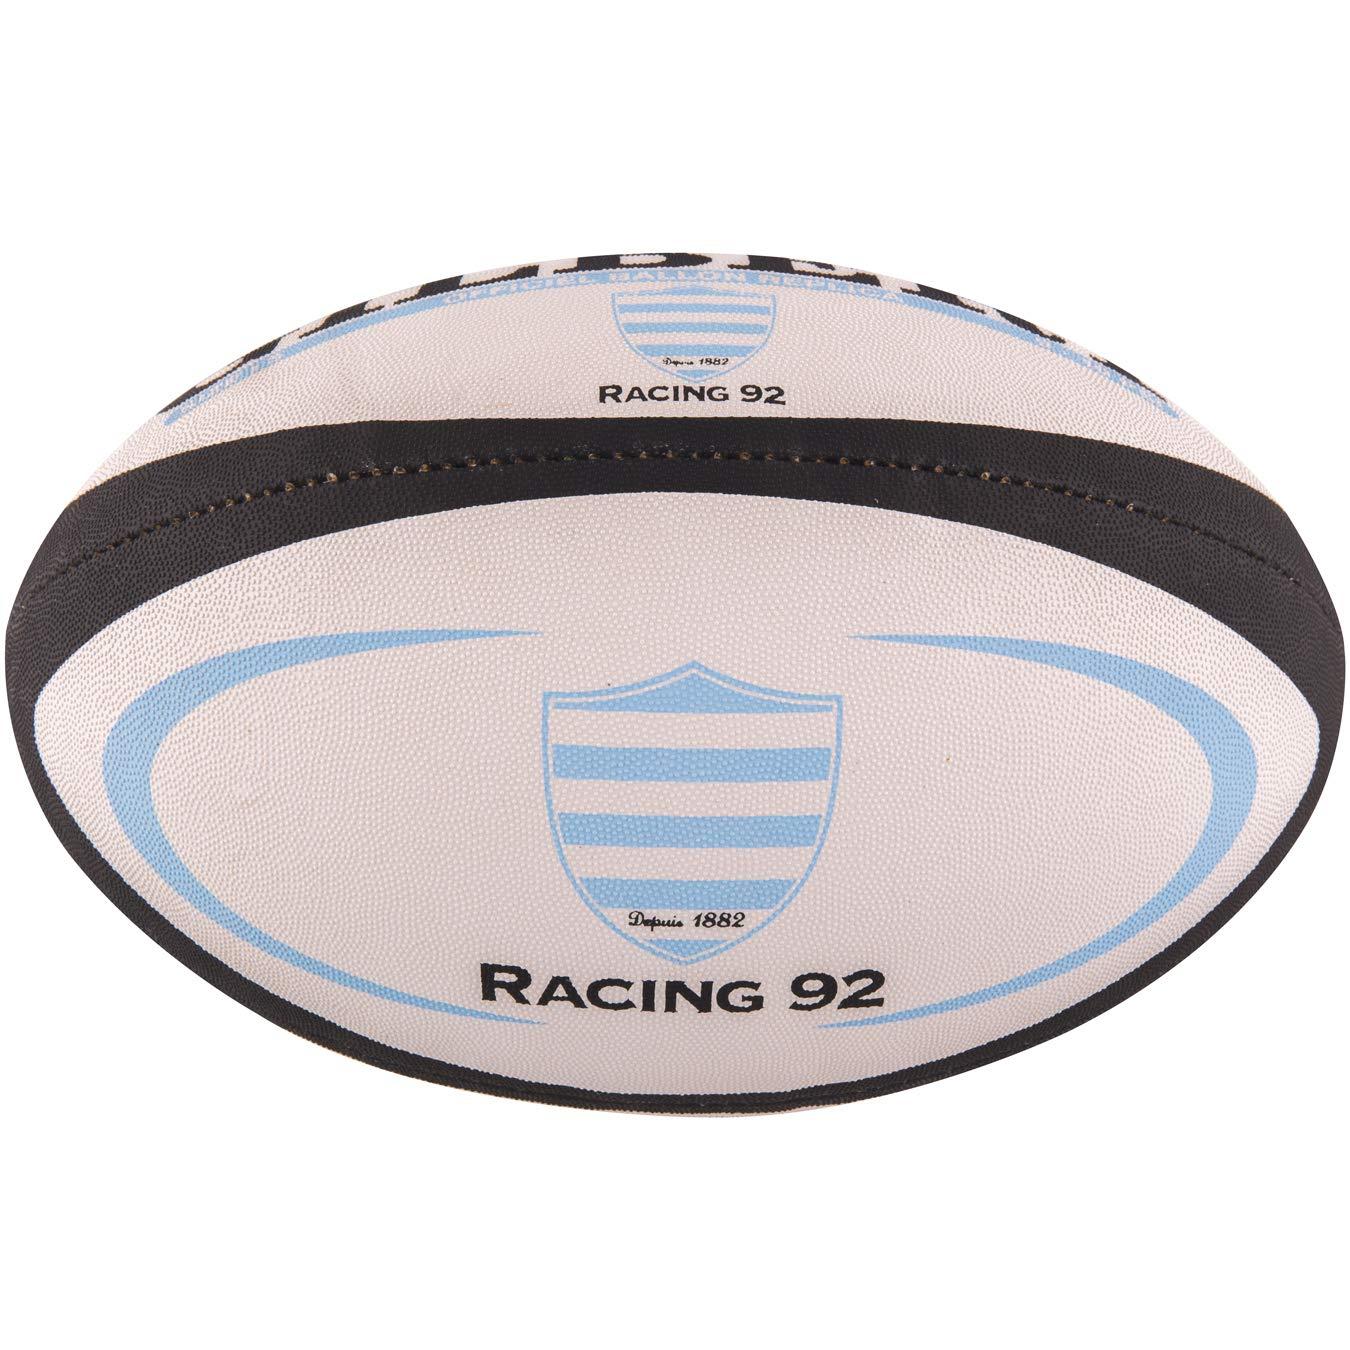 Gilbert Ballon Rugby - Réplica Racing 92 - Mini 5024686276141